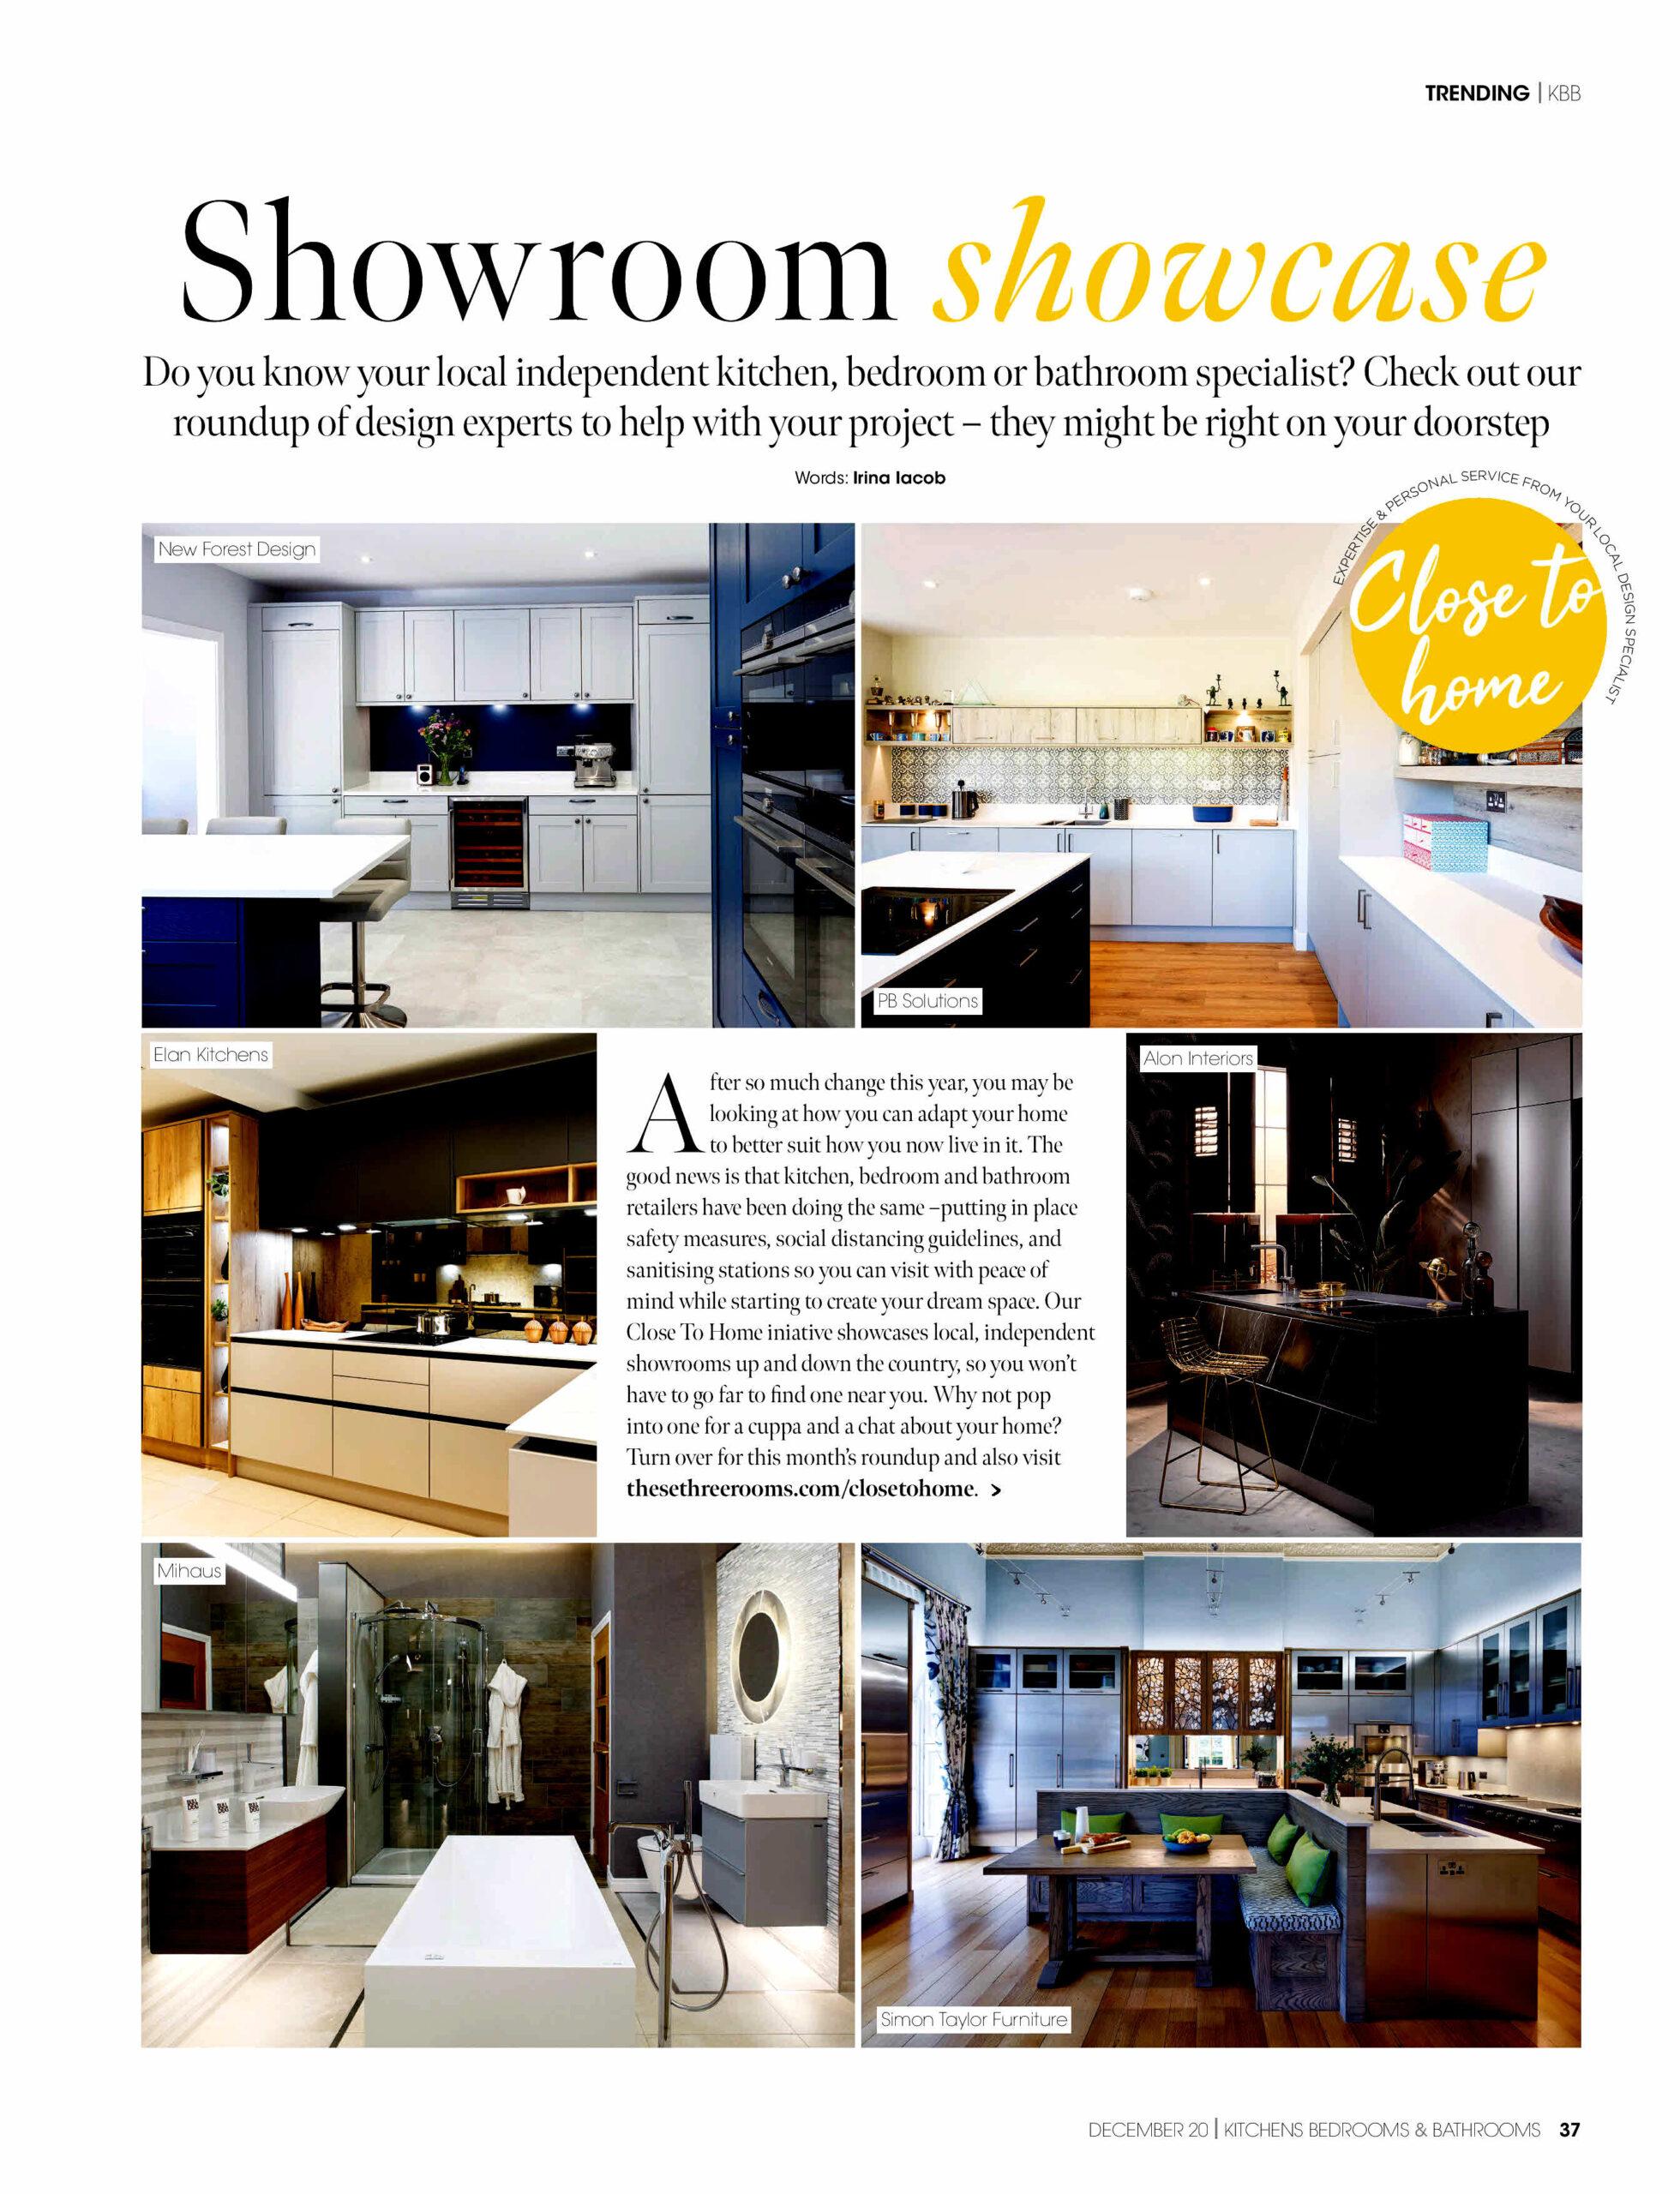 KBB Showroom Showcase 1.1